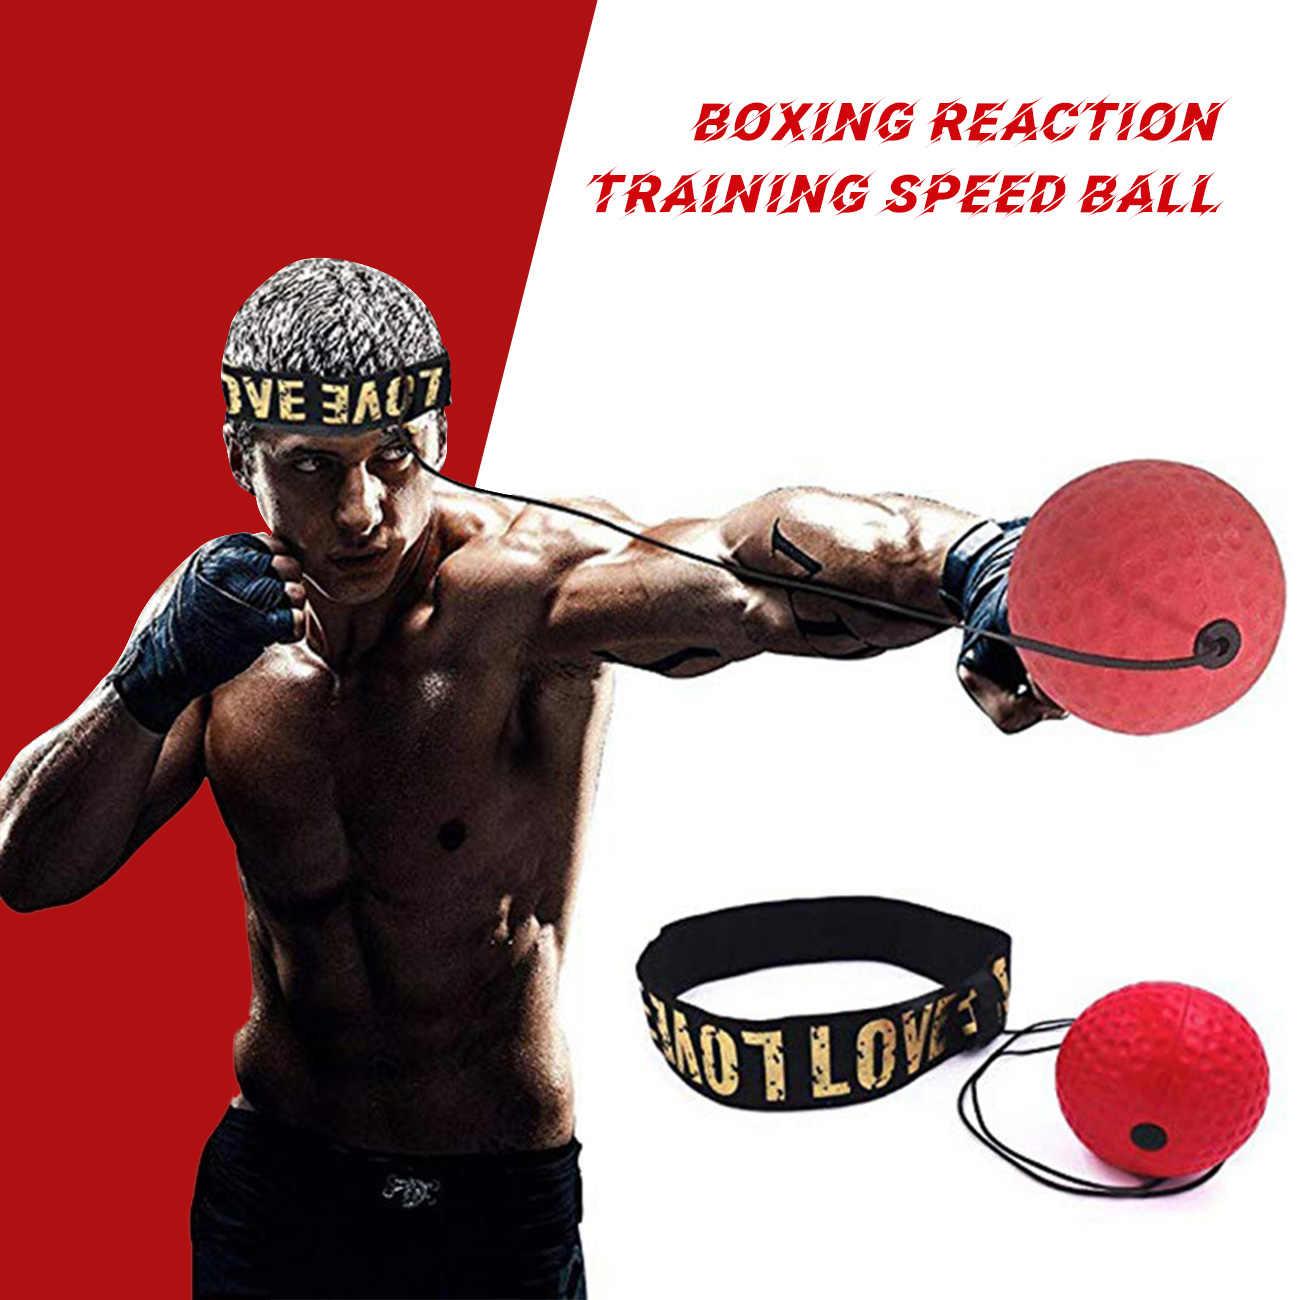 HEELPPO Bola Boxeo Pelota Boxeo Puching Ball De Boxeo El Equipo De Entrenamiento Pelota De Boxeo Diadema Cabeza De Bola De Reflejos De Boxeo Punchball De Adultos Boxeo Diadema Bola